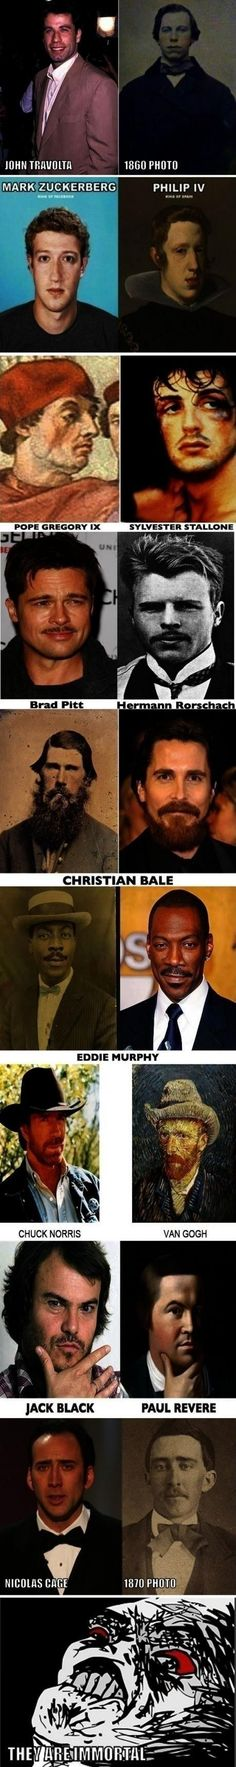 Funny Celebrities Historical Look-Alikes vol.2